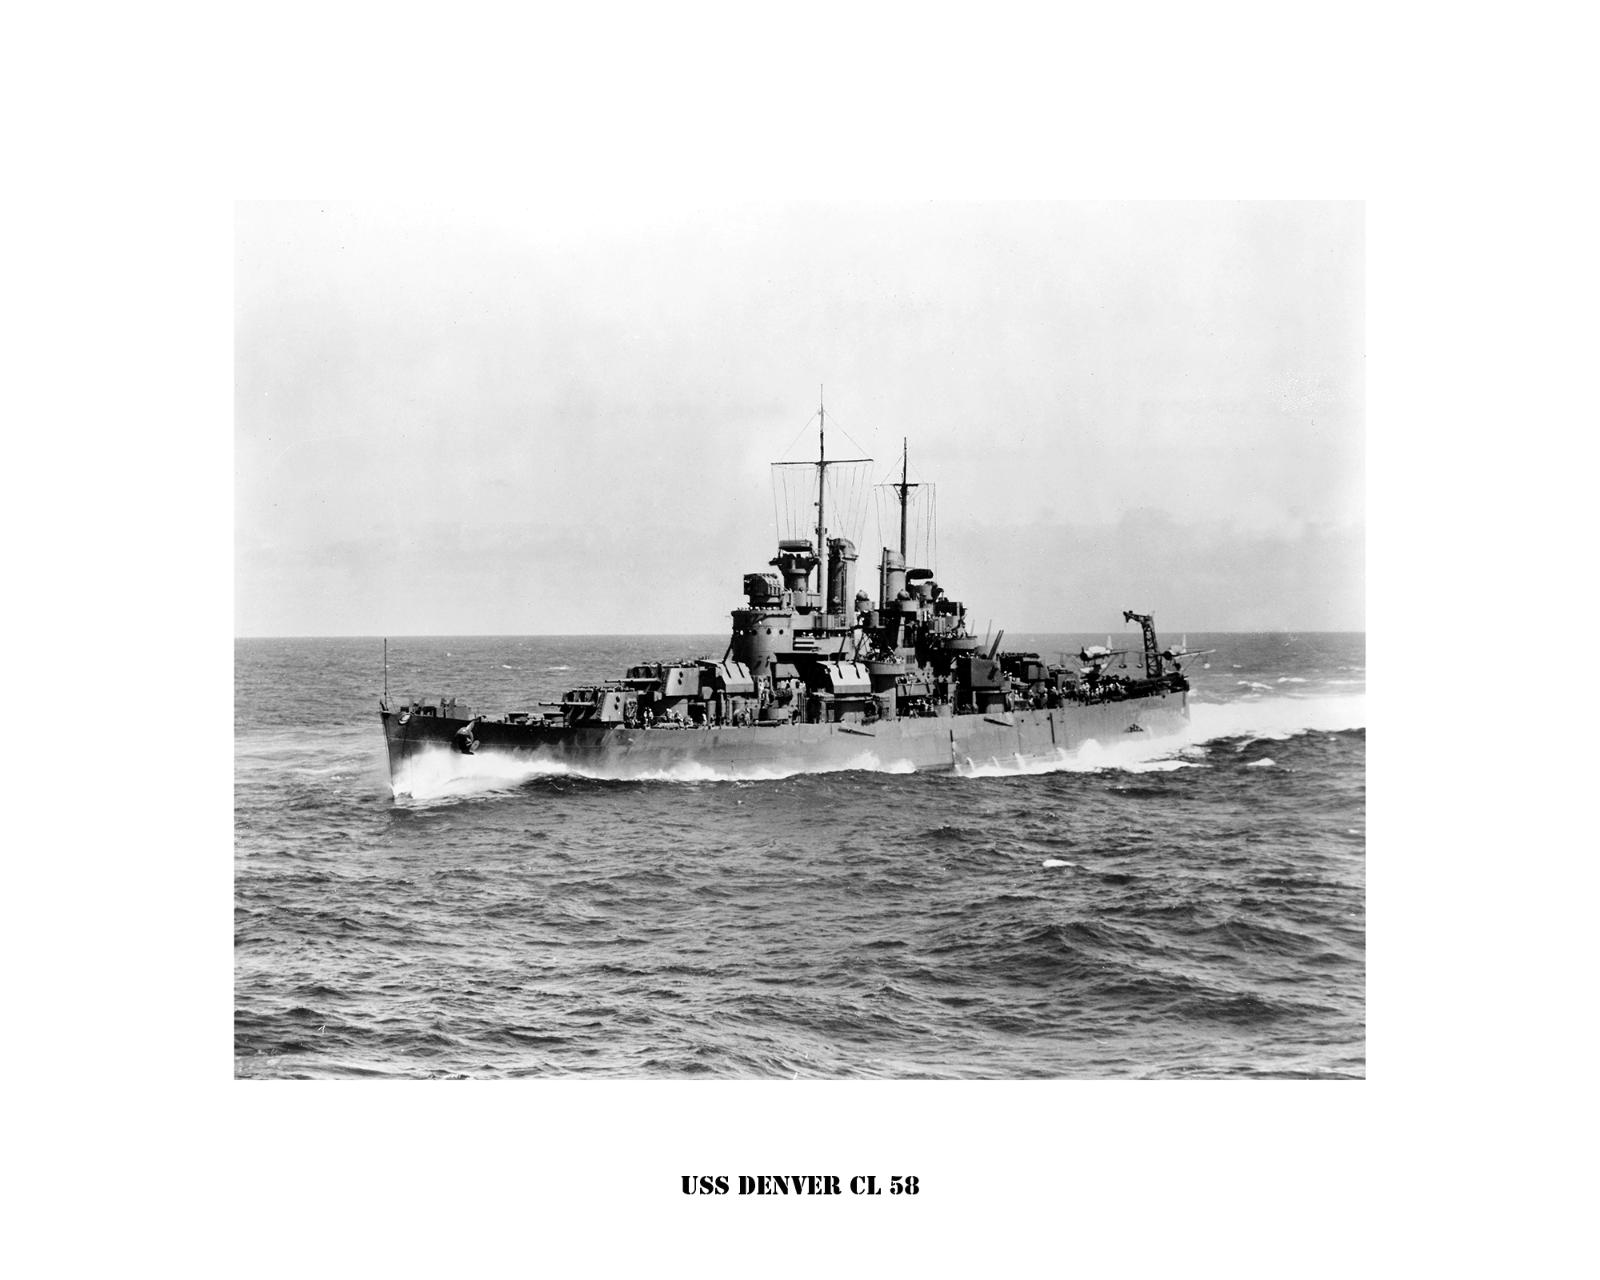 USS DENVER CL 58 Naval Ship Photo Drucken, USN Navy